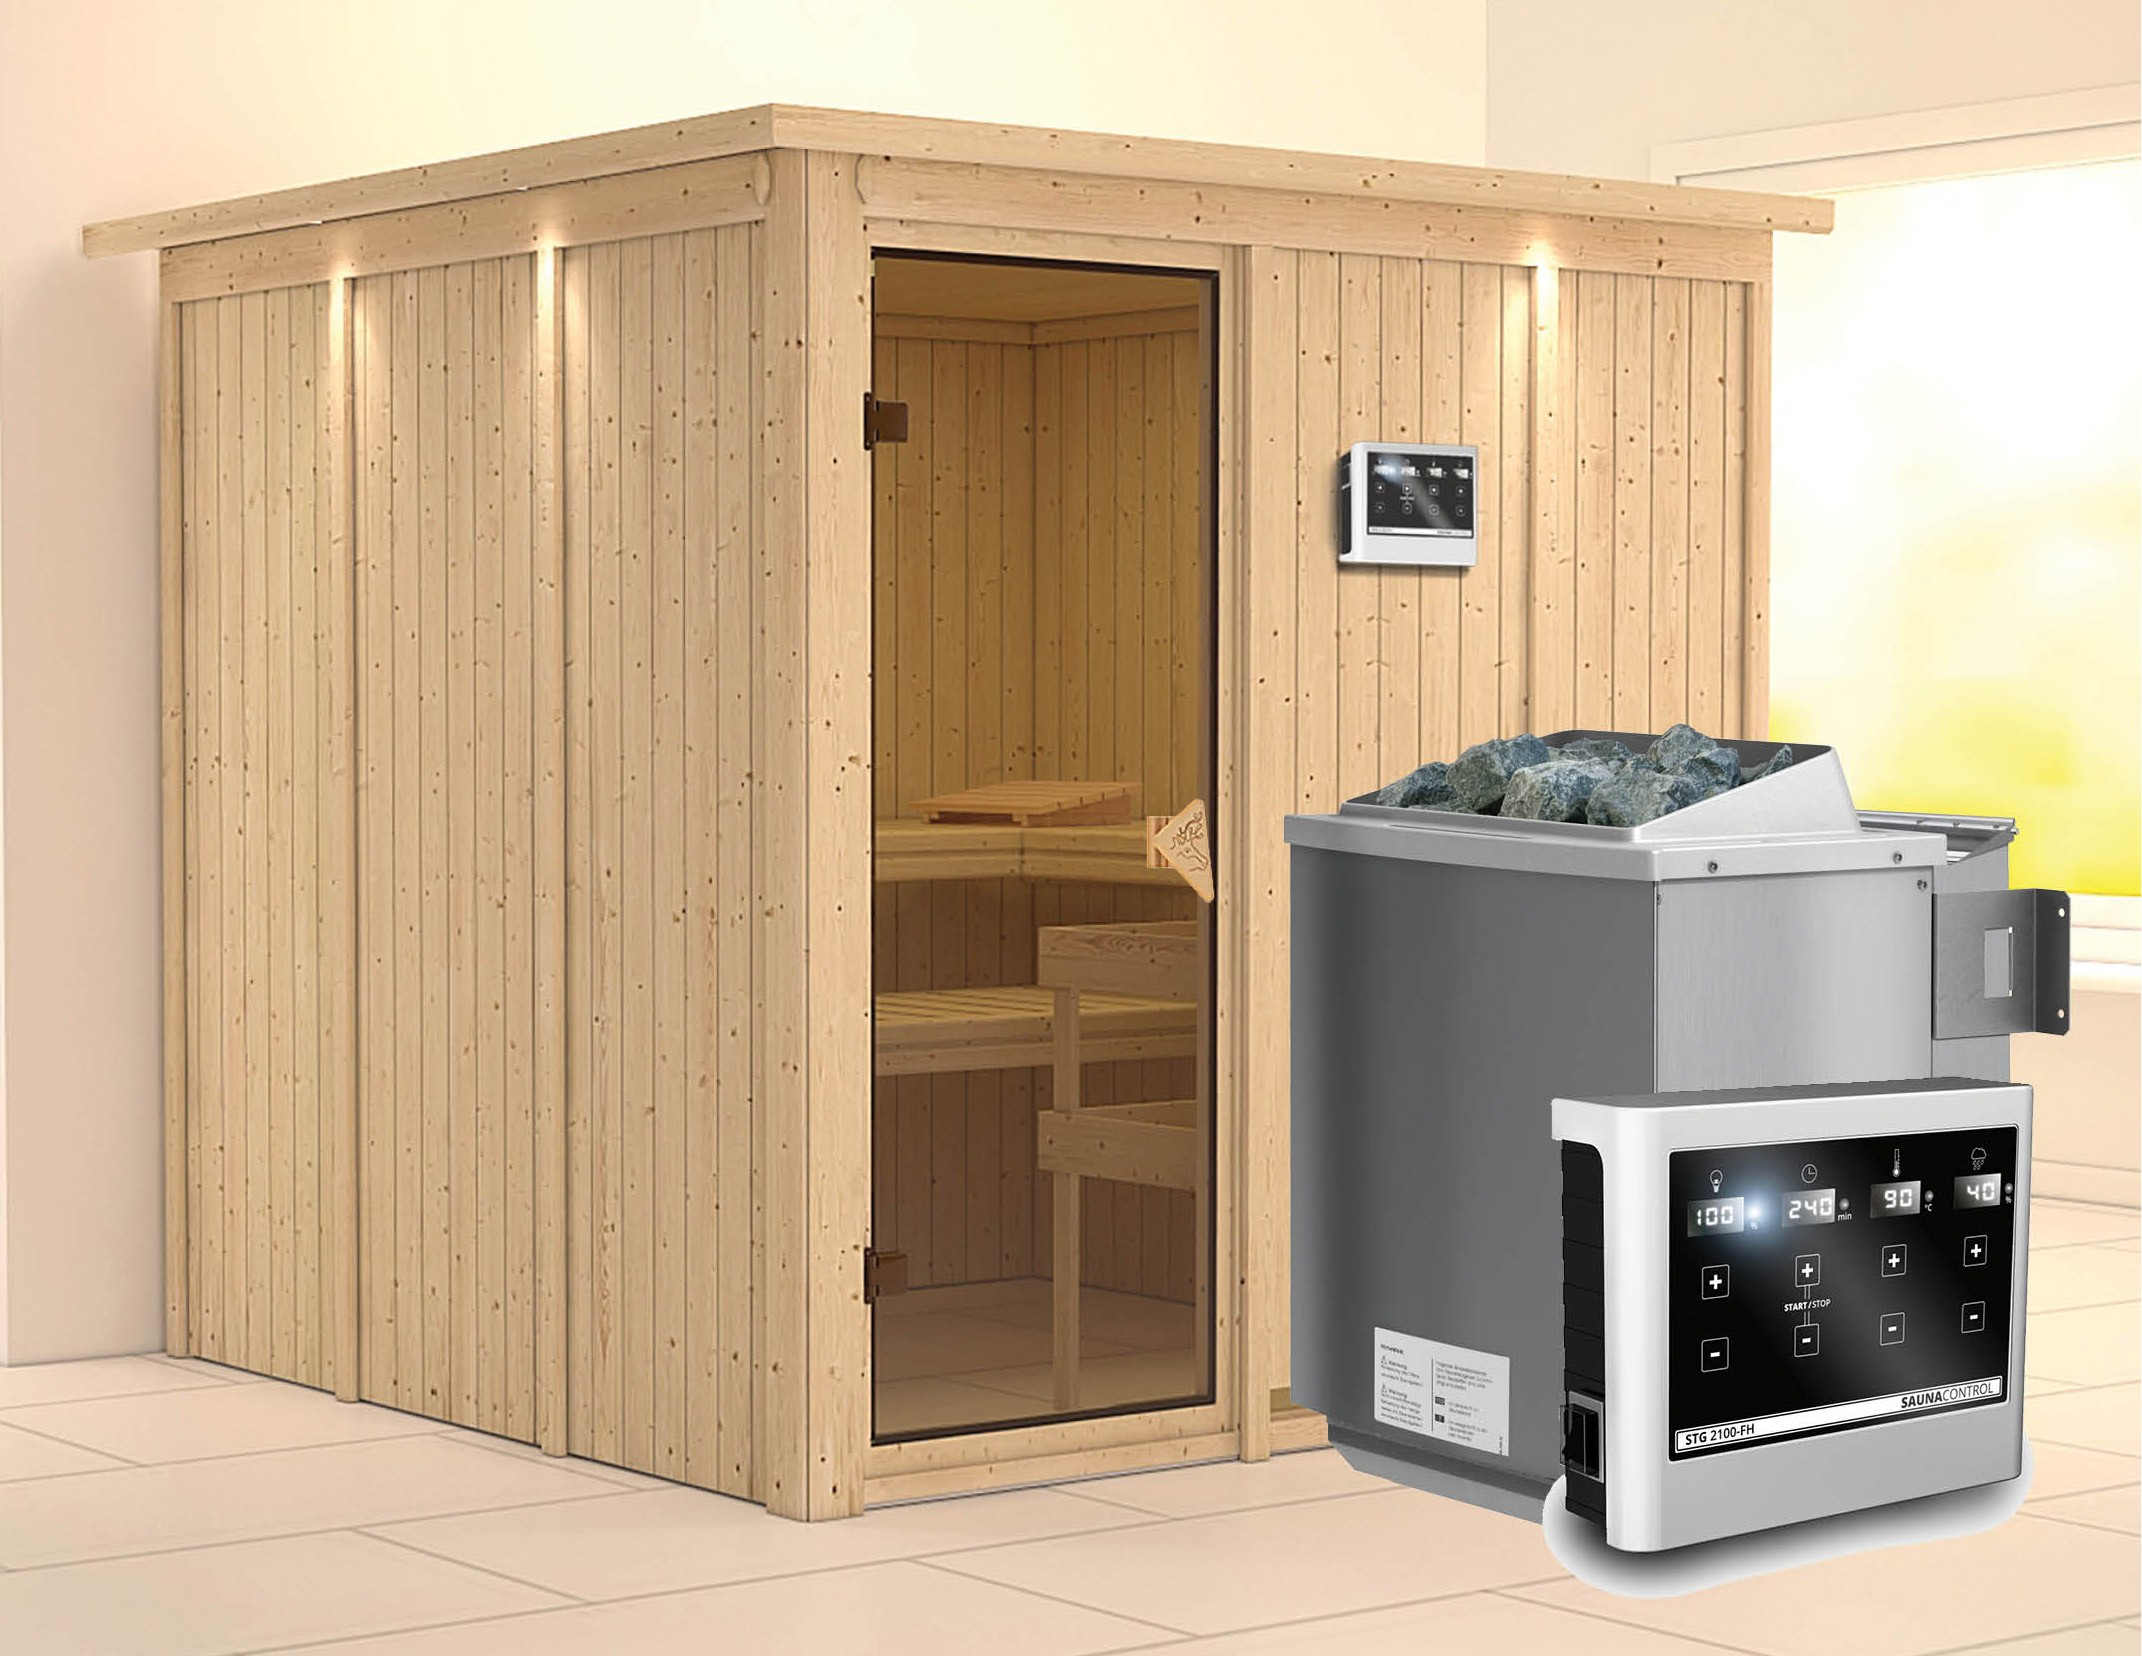 Karibu Sauna Rodin 68mm Dachkranz + Bio Ofen 9kW extern classic Tür Bild 1